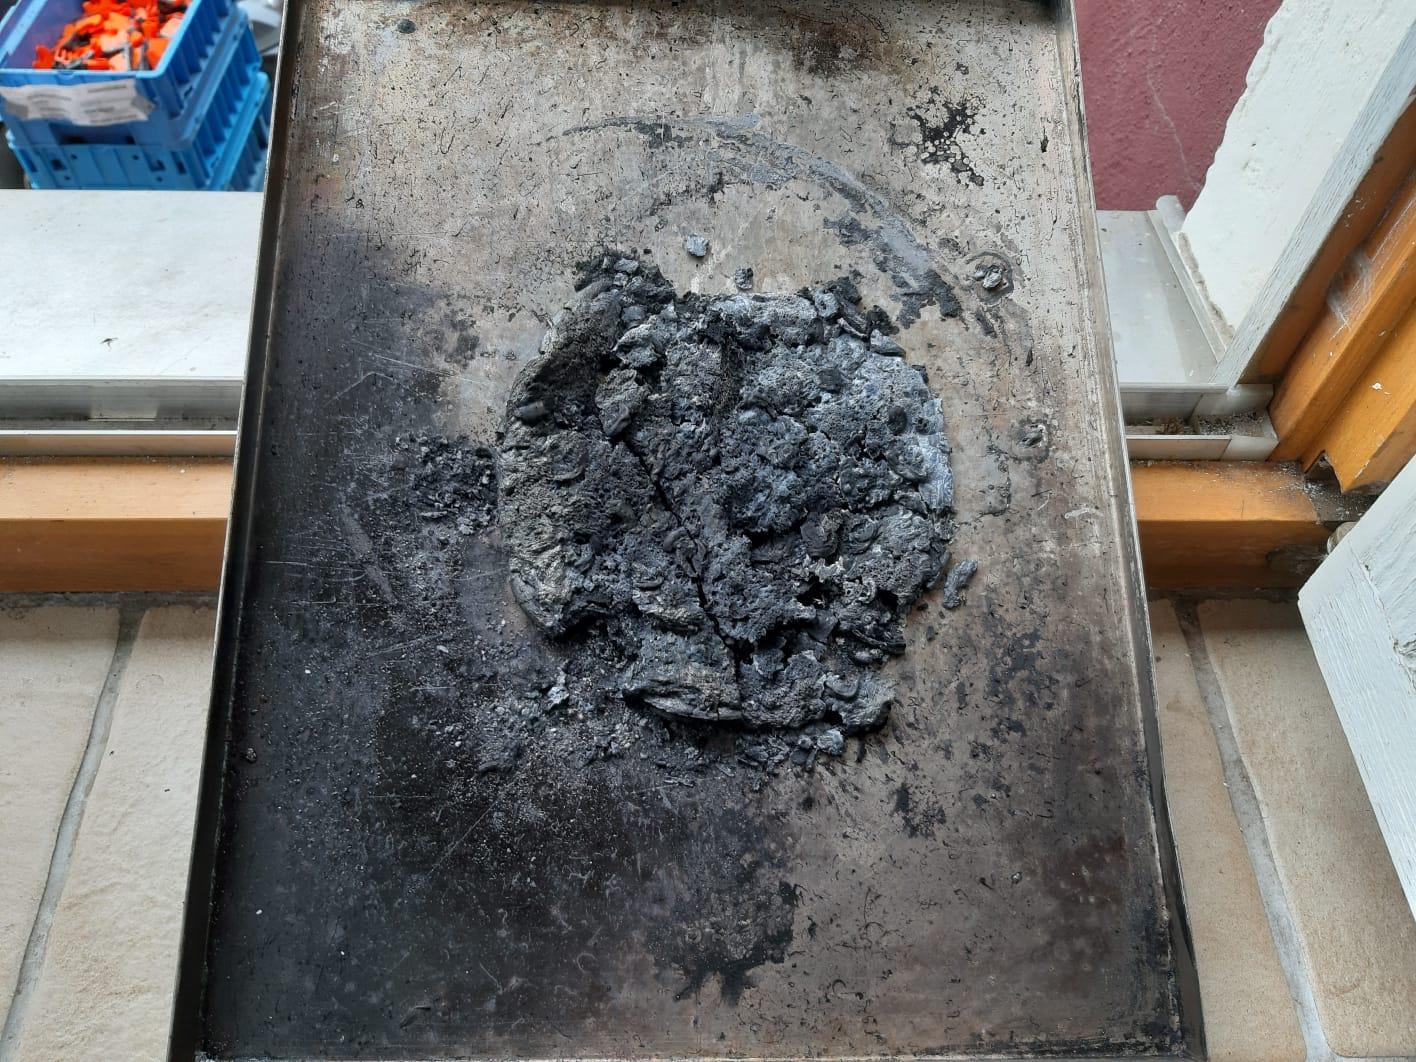 Holzofen explodiert, alles verraucht 23.10.2020